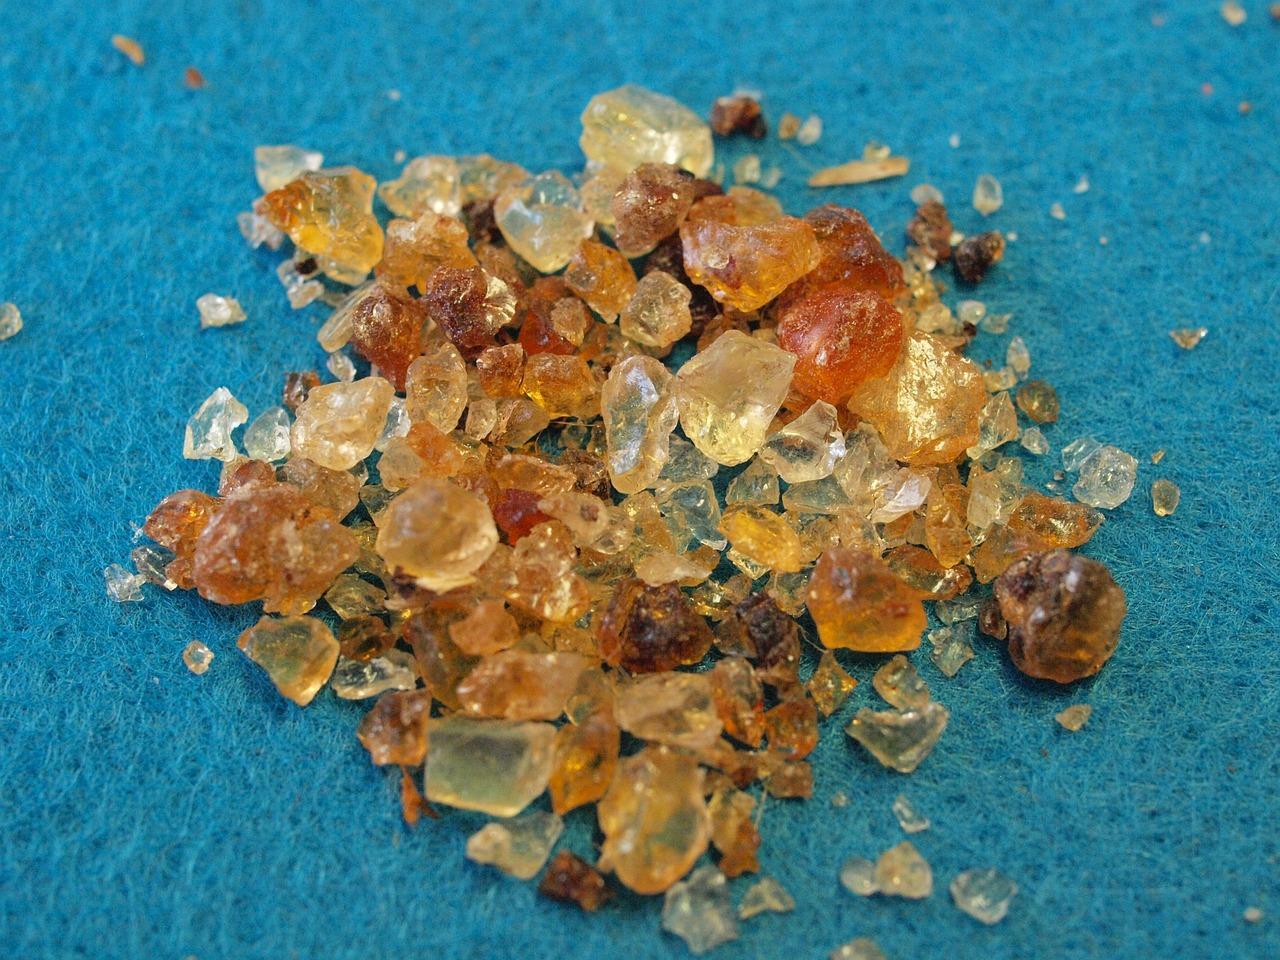 gum arabic 763043 1280